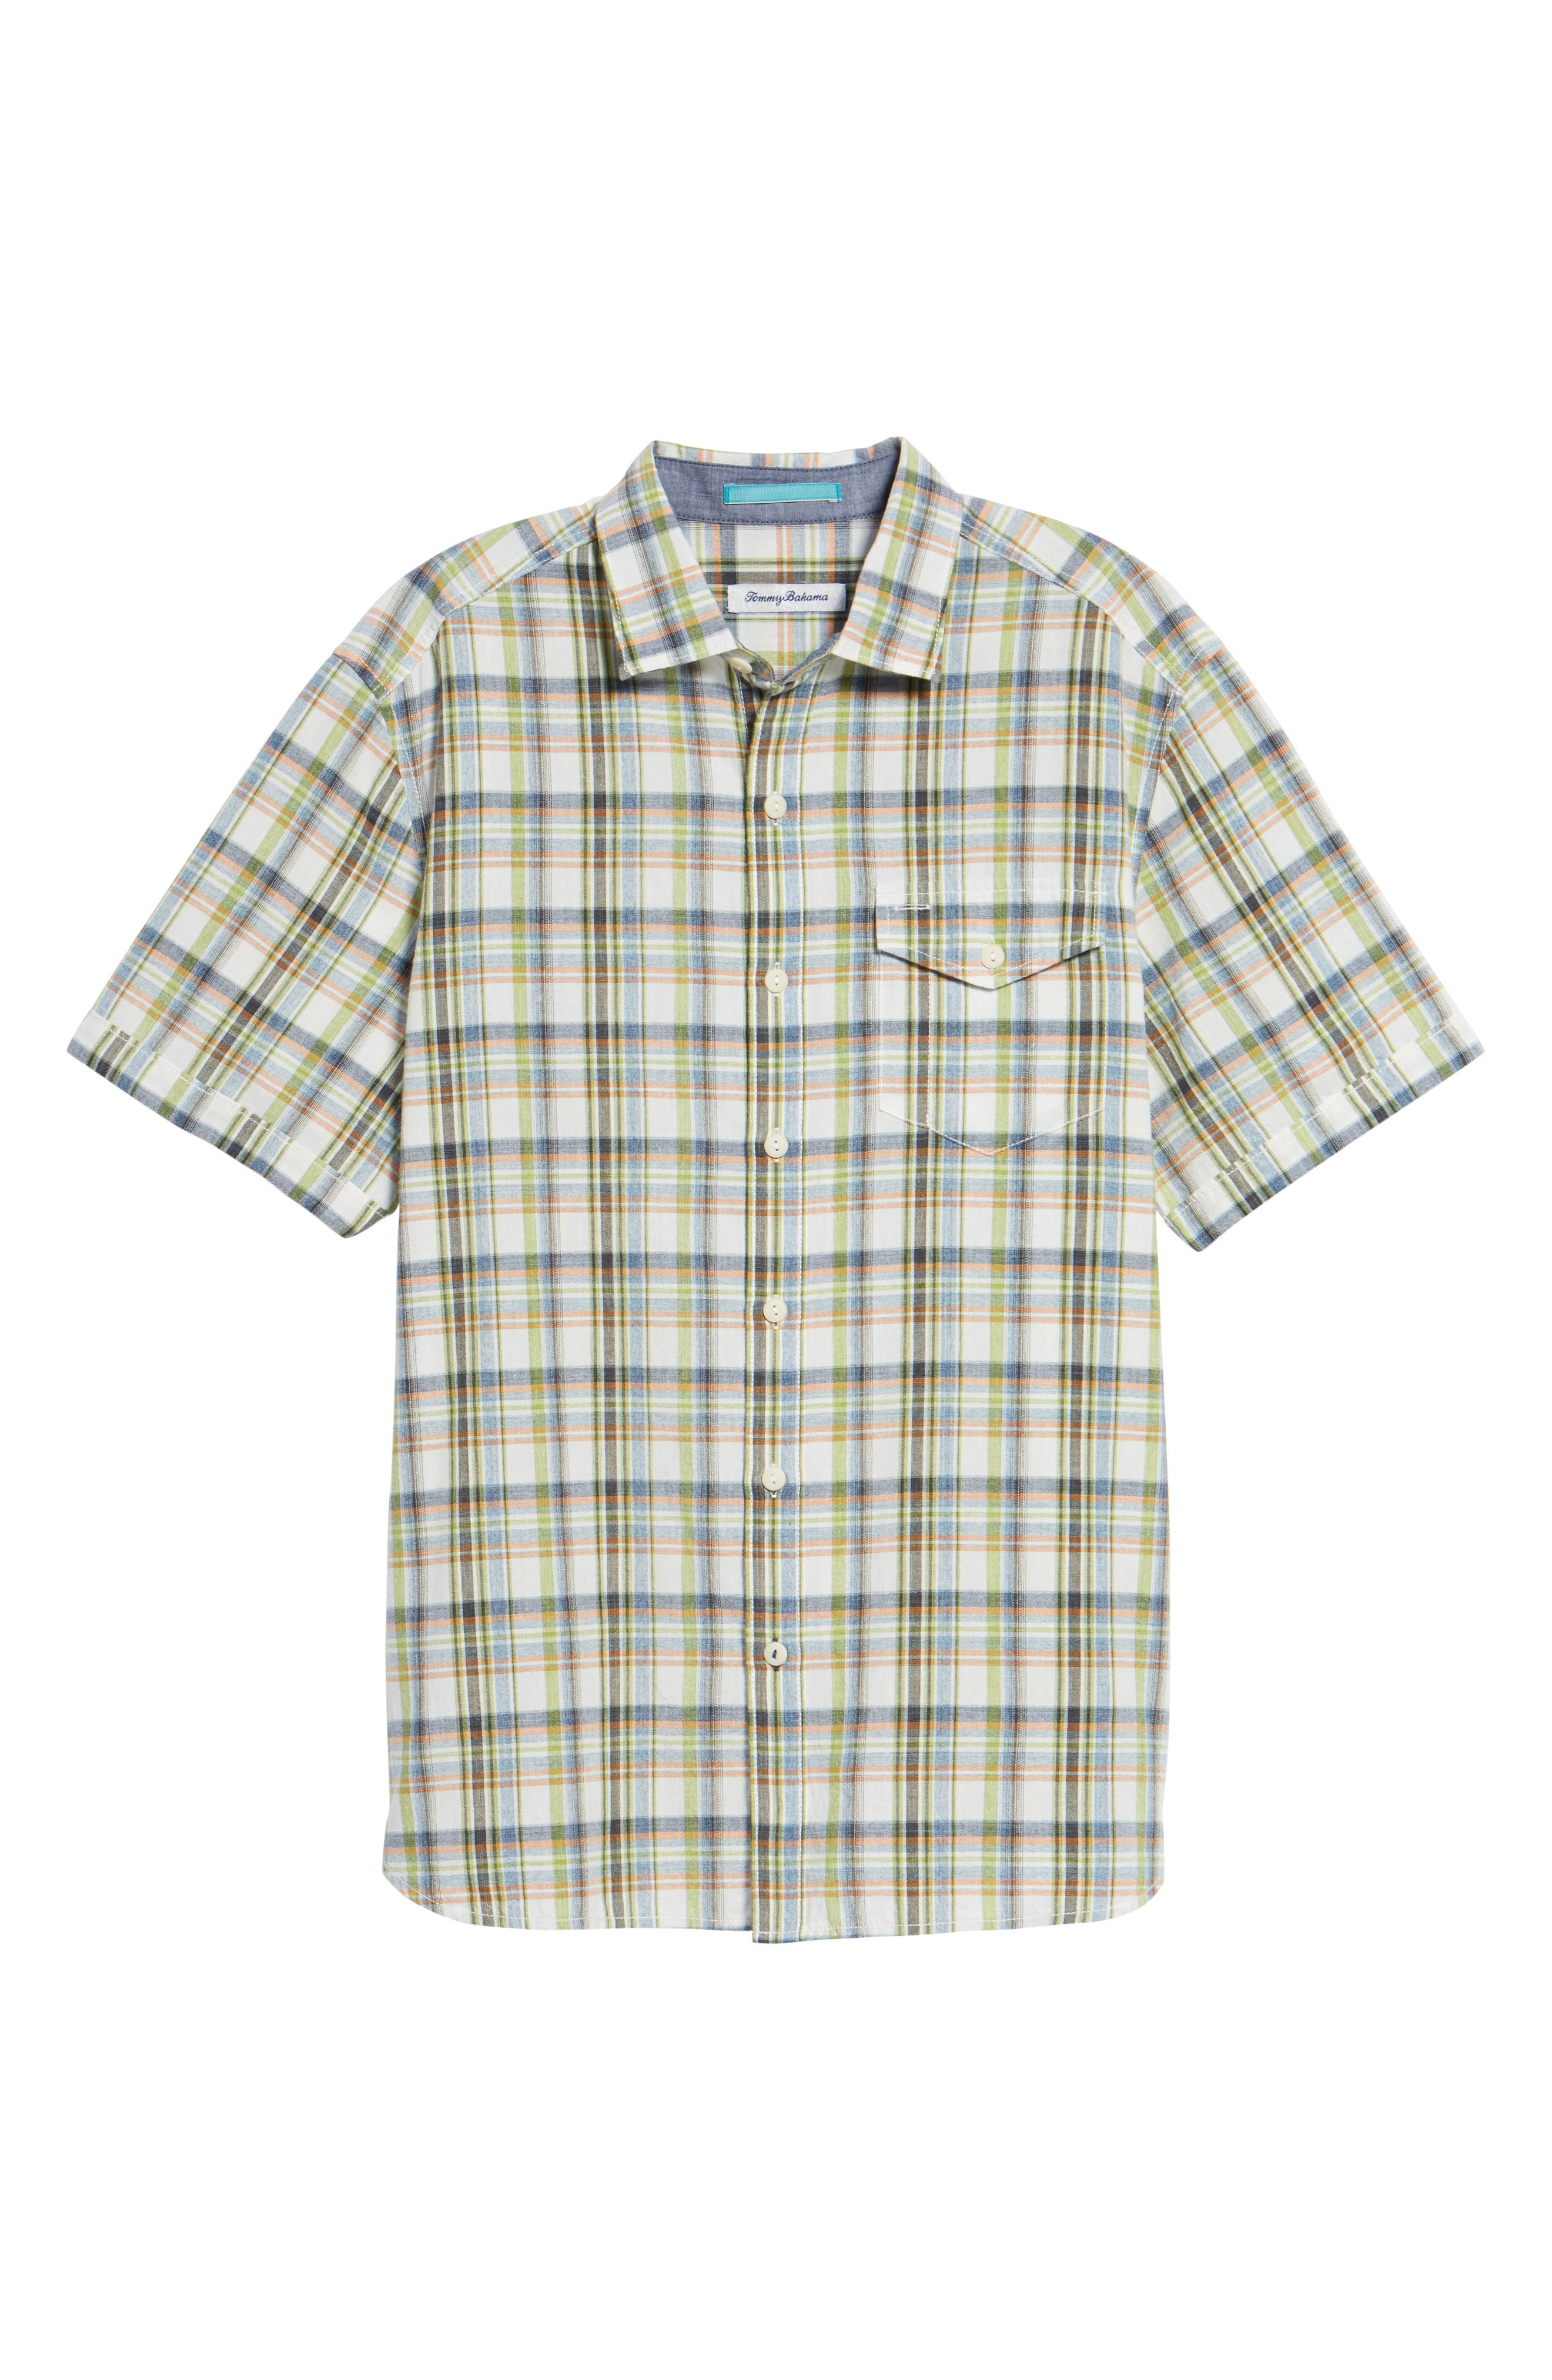 Ocean Cay Plaid Sport Shirt,                             Alternate thumbnail 6, color,                             Tart Apple